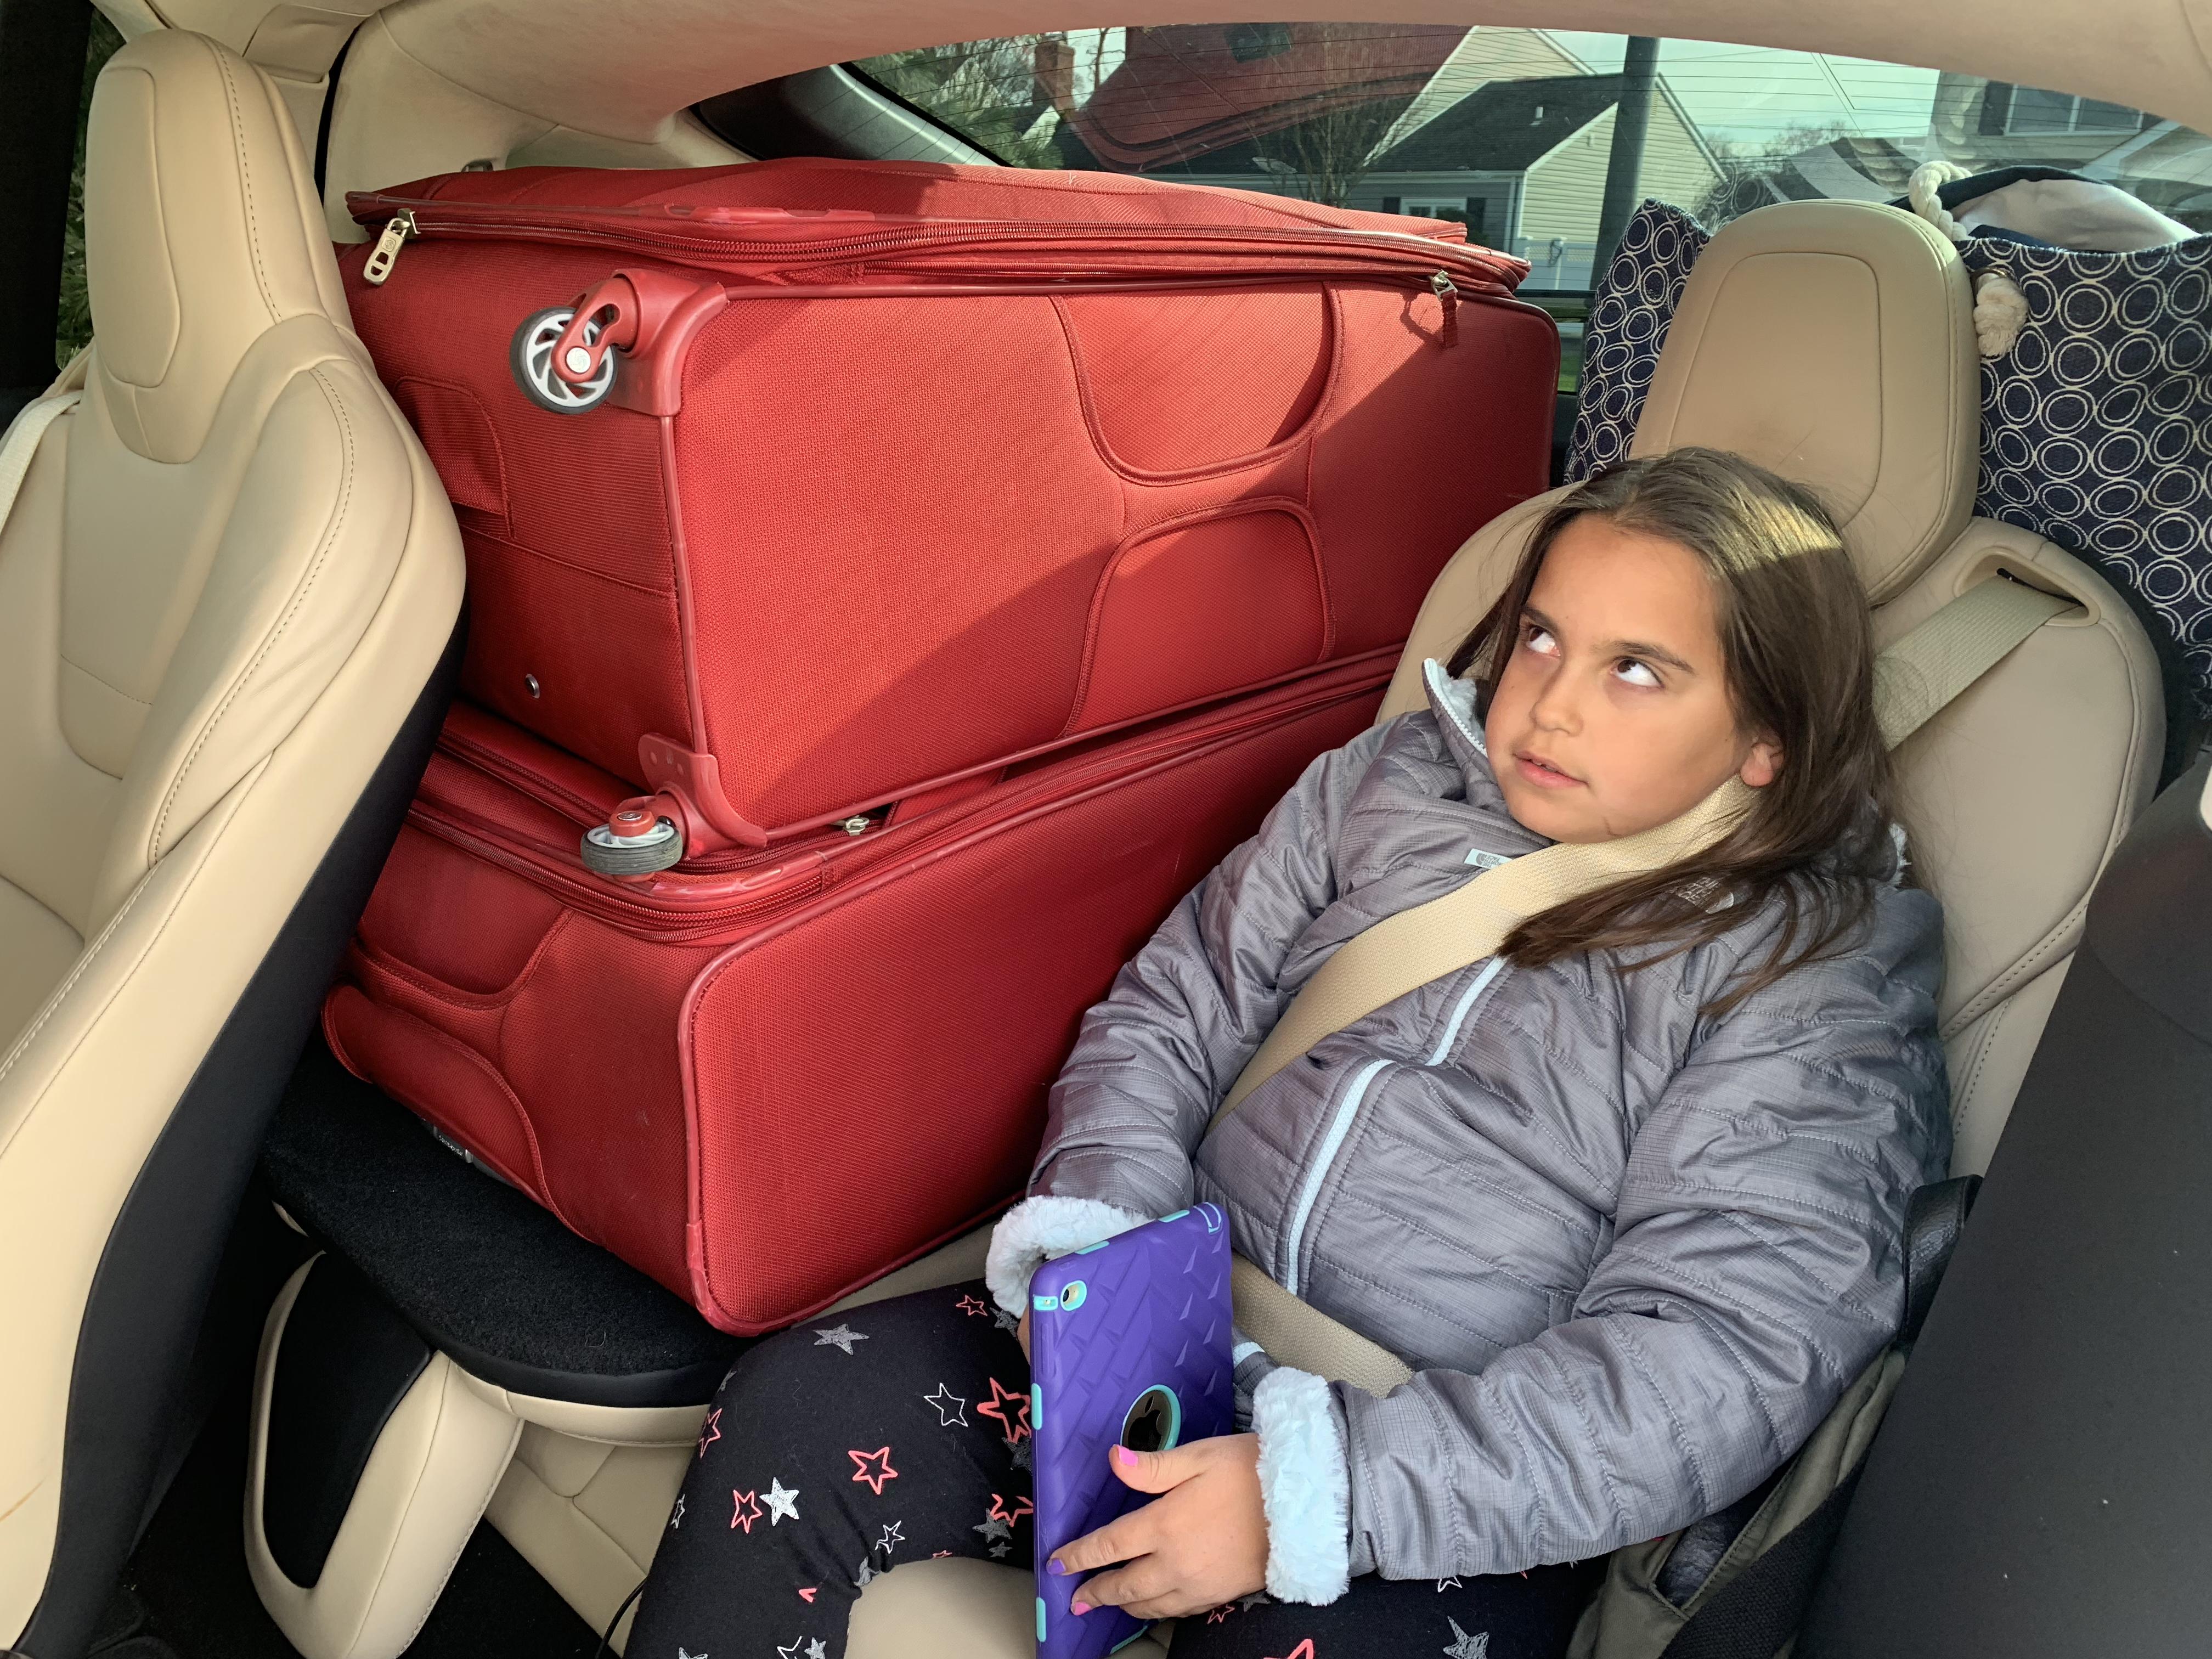 tesla-model-x-3rd-row-luggage